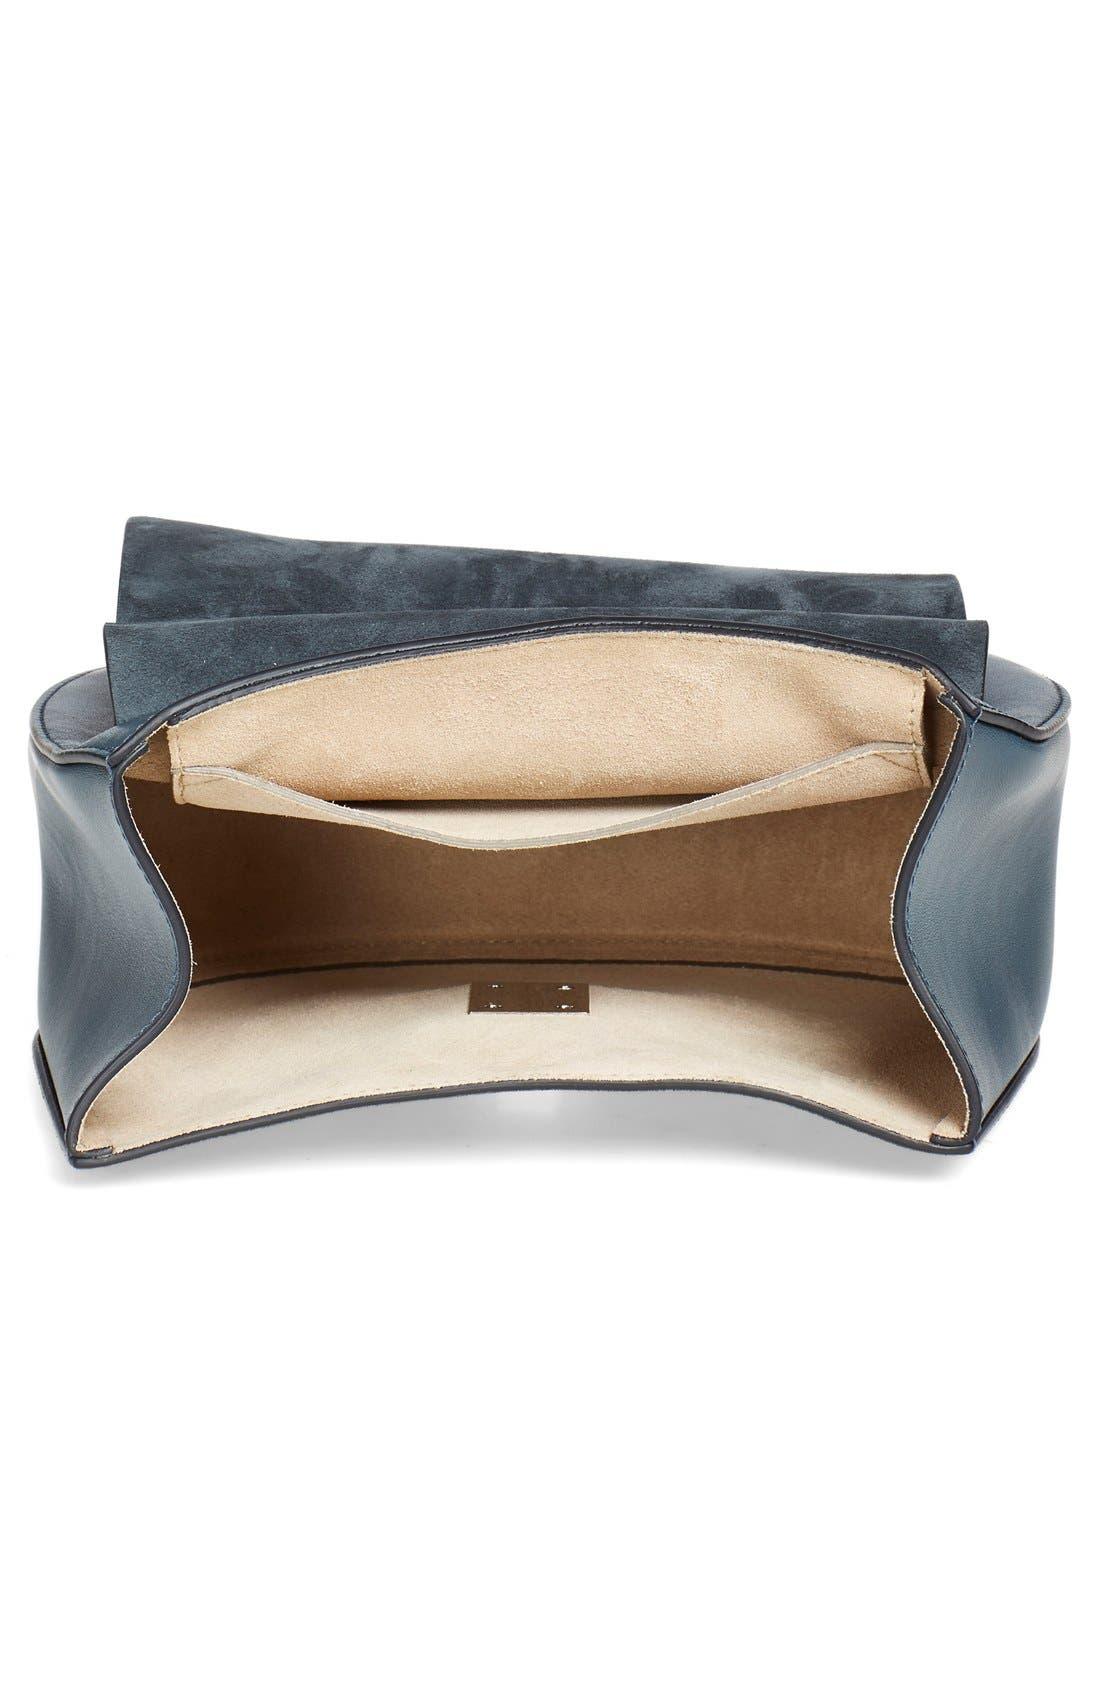 Alternate Image 3  - Chloé Small Drew Leather & Suede Shoulder Bag